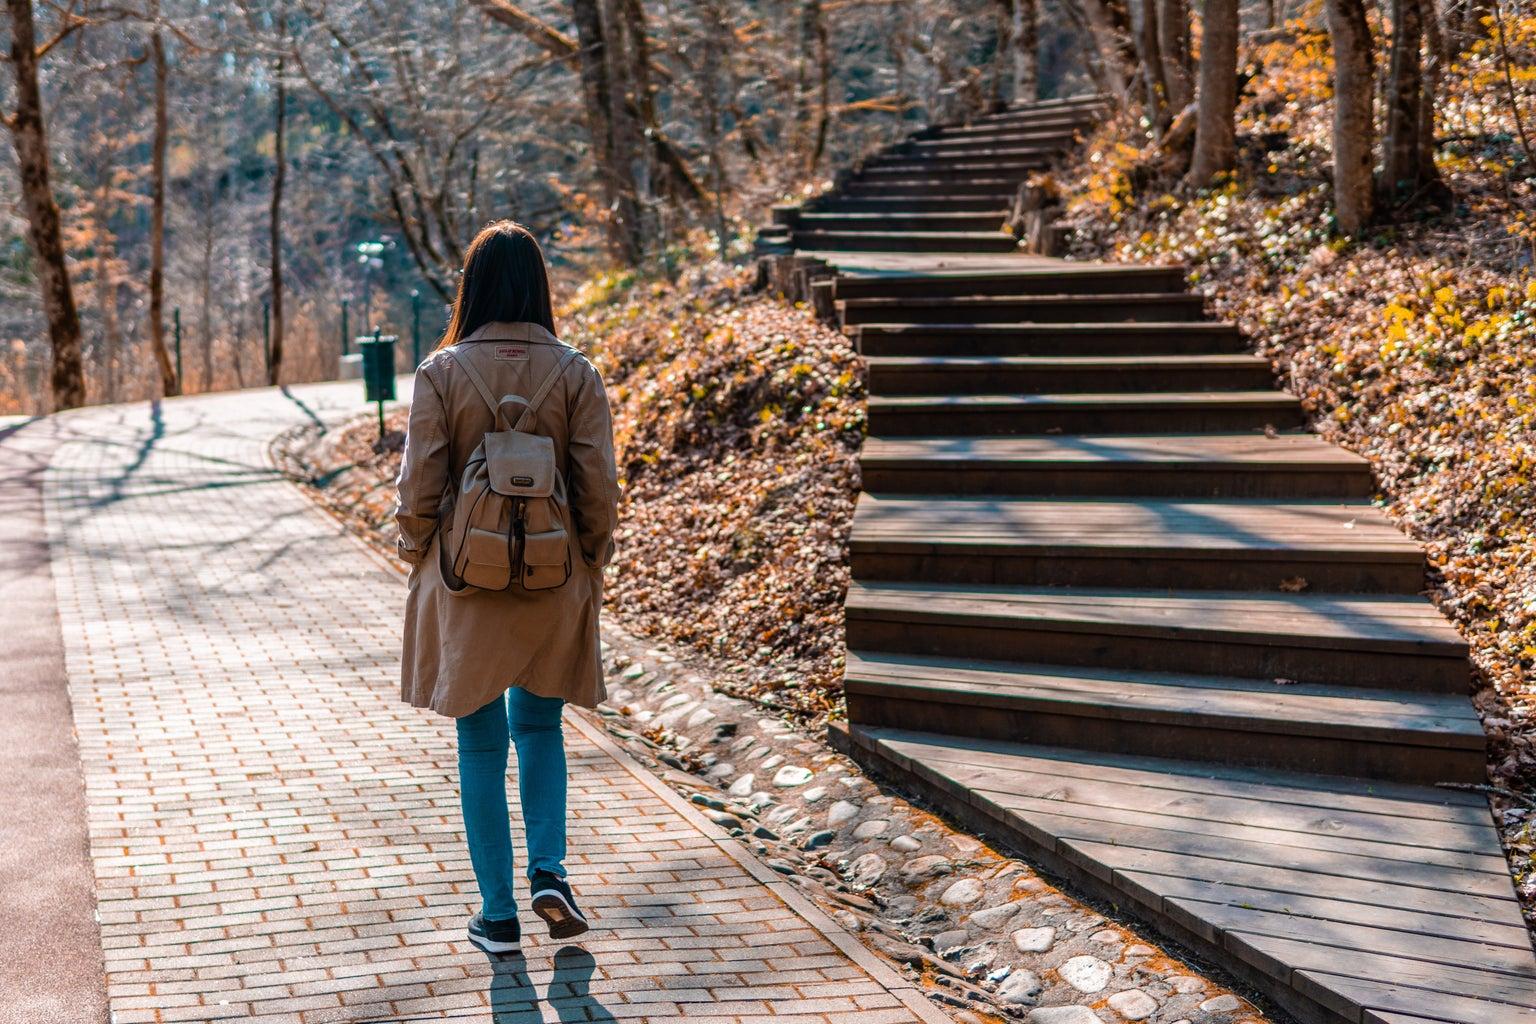 woman Walking On Brick Road